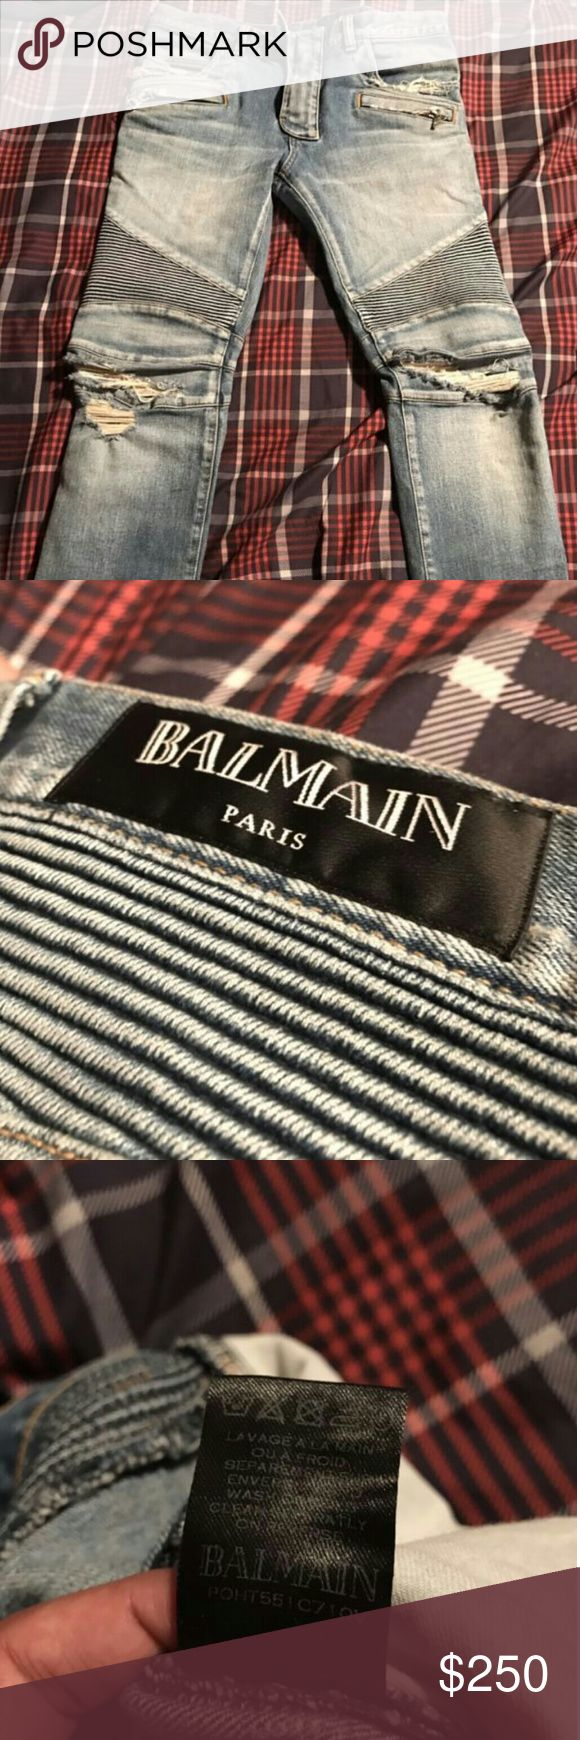 Balmain Jeans Size:31 destressed blue balmain jeans Balmain Jeans